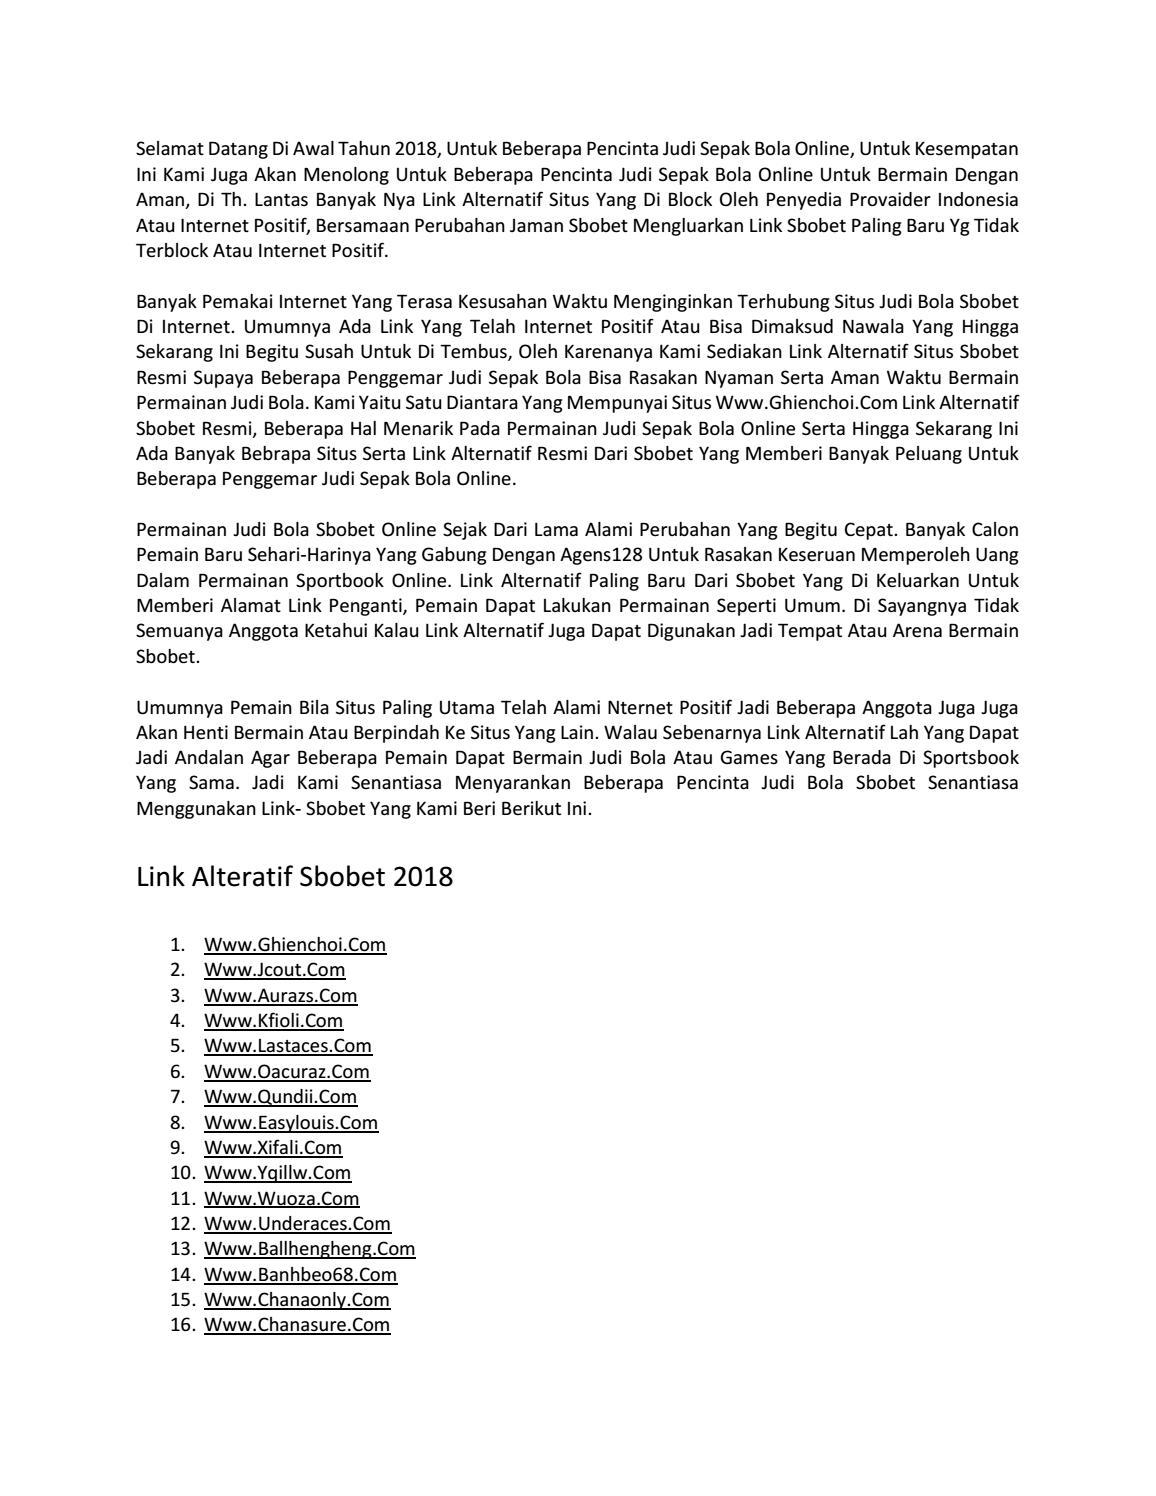 Link Alternatif Sbobet Terbaru 2018 Di Indonesia By Agens128pialadunia2018 Issuu